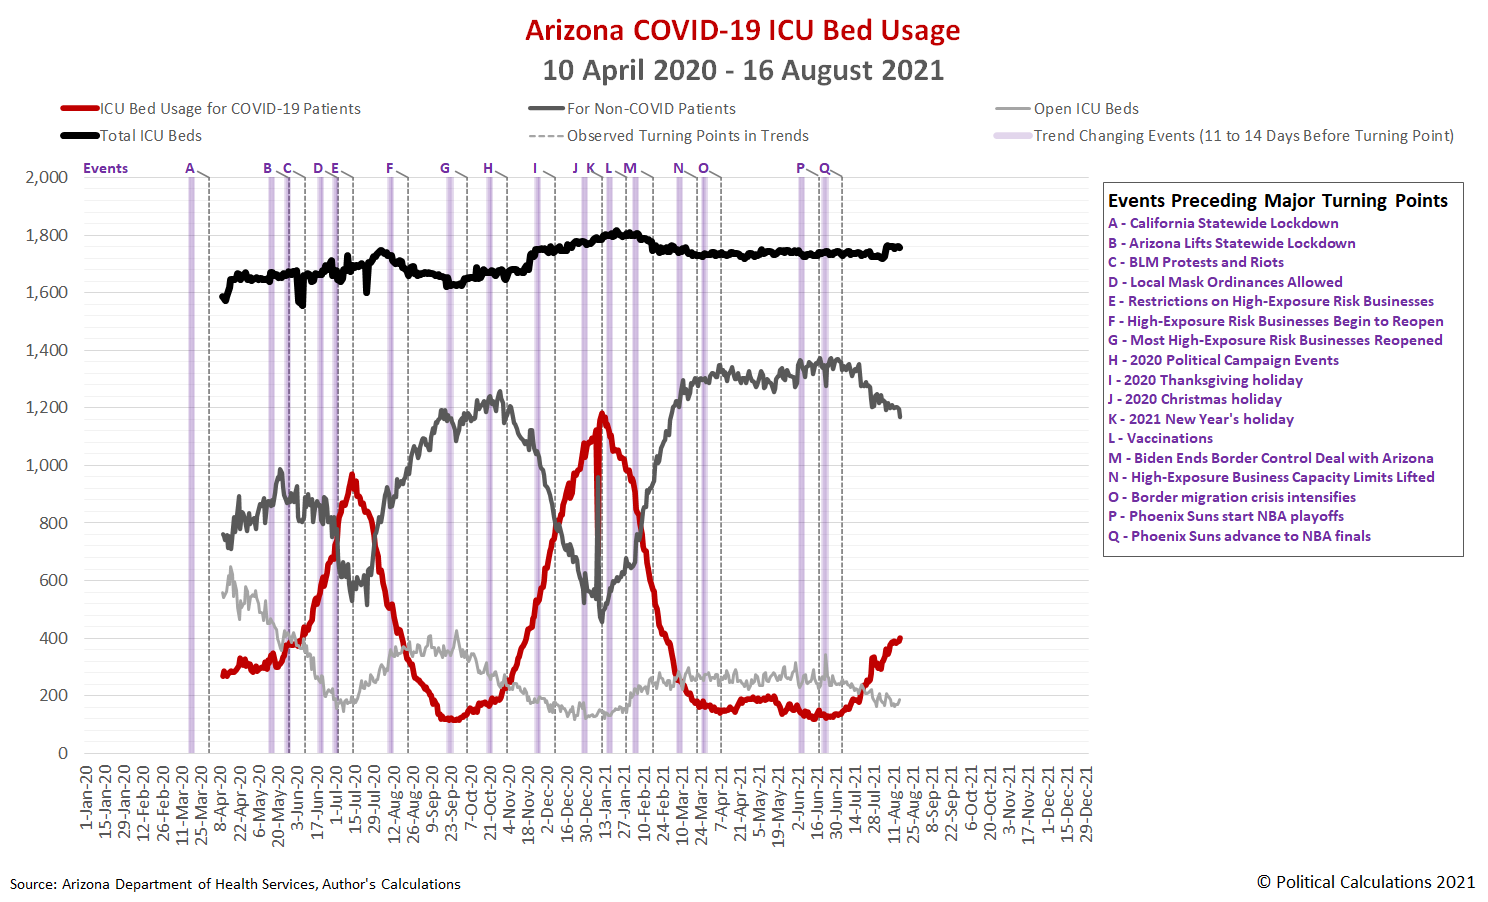 Arizona COVID-19 ICU Bed Usage, 10 April 2020 - 15 August 2021, Logarithmic Scale